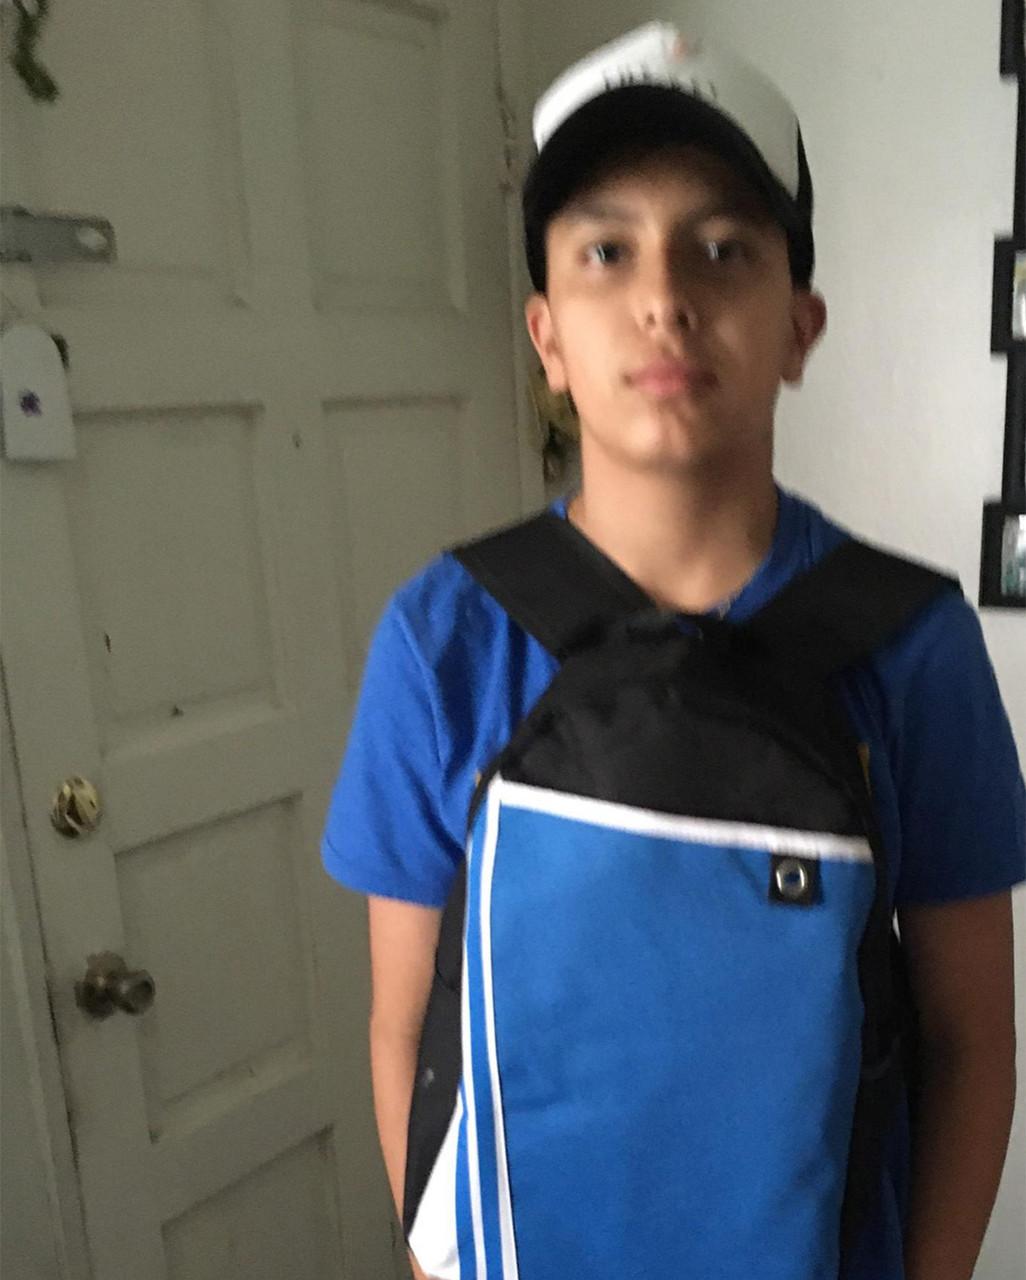 Suarez Backpack Distribution